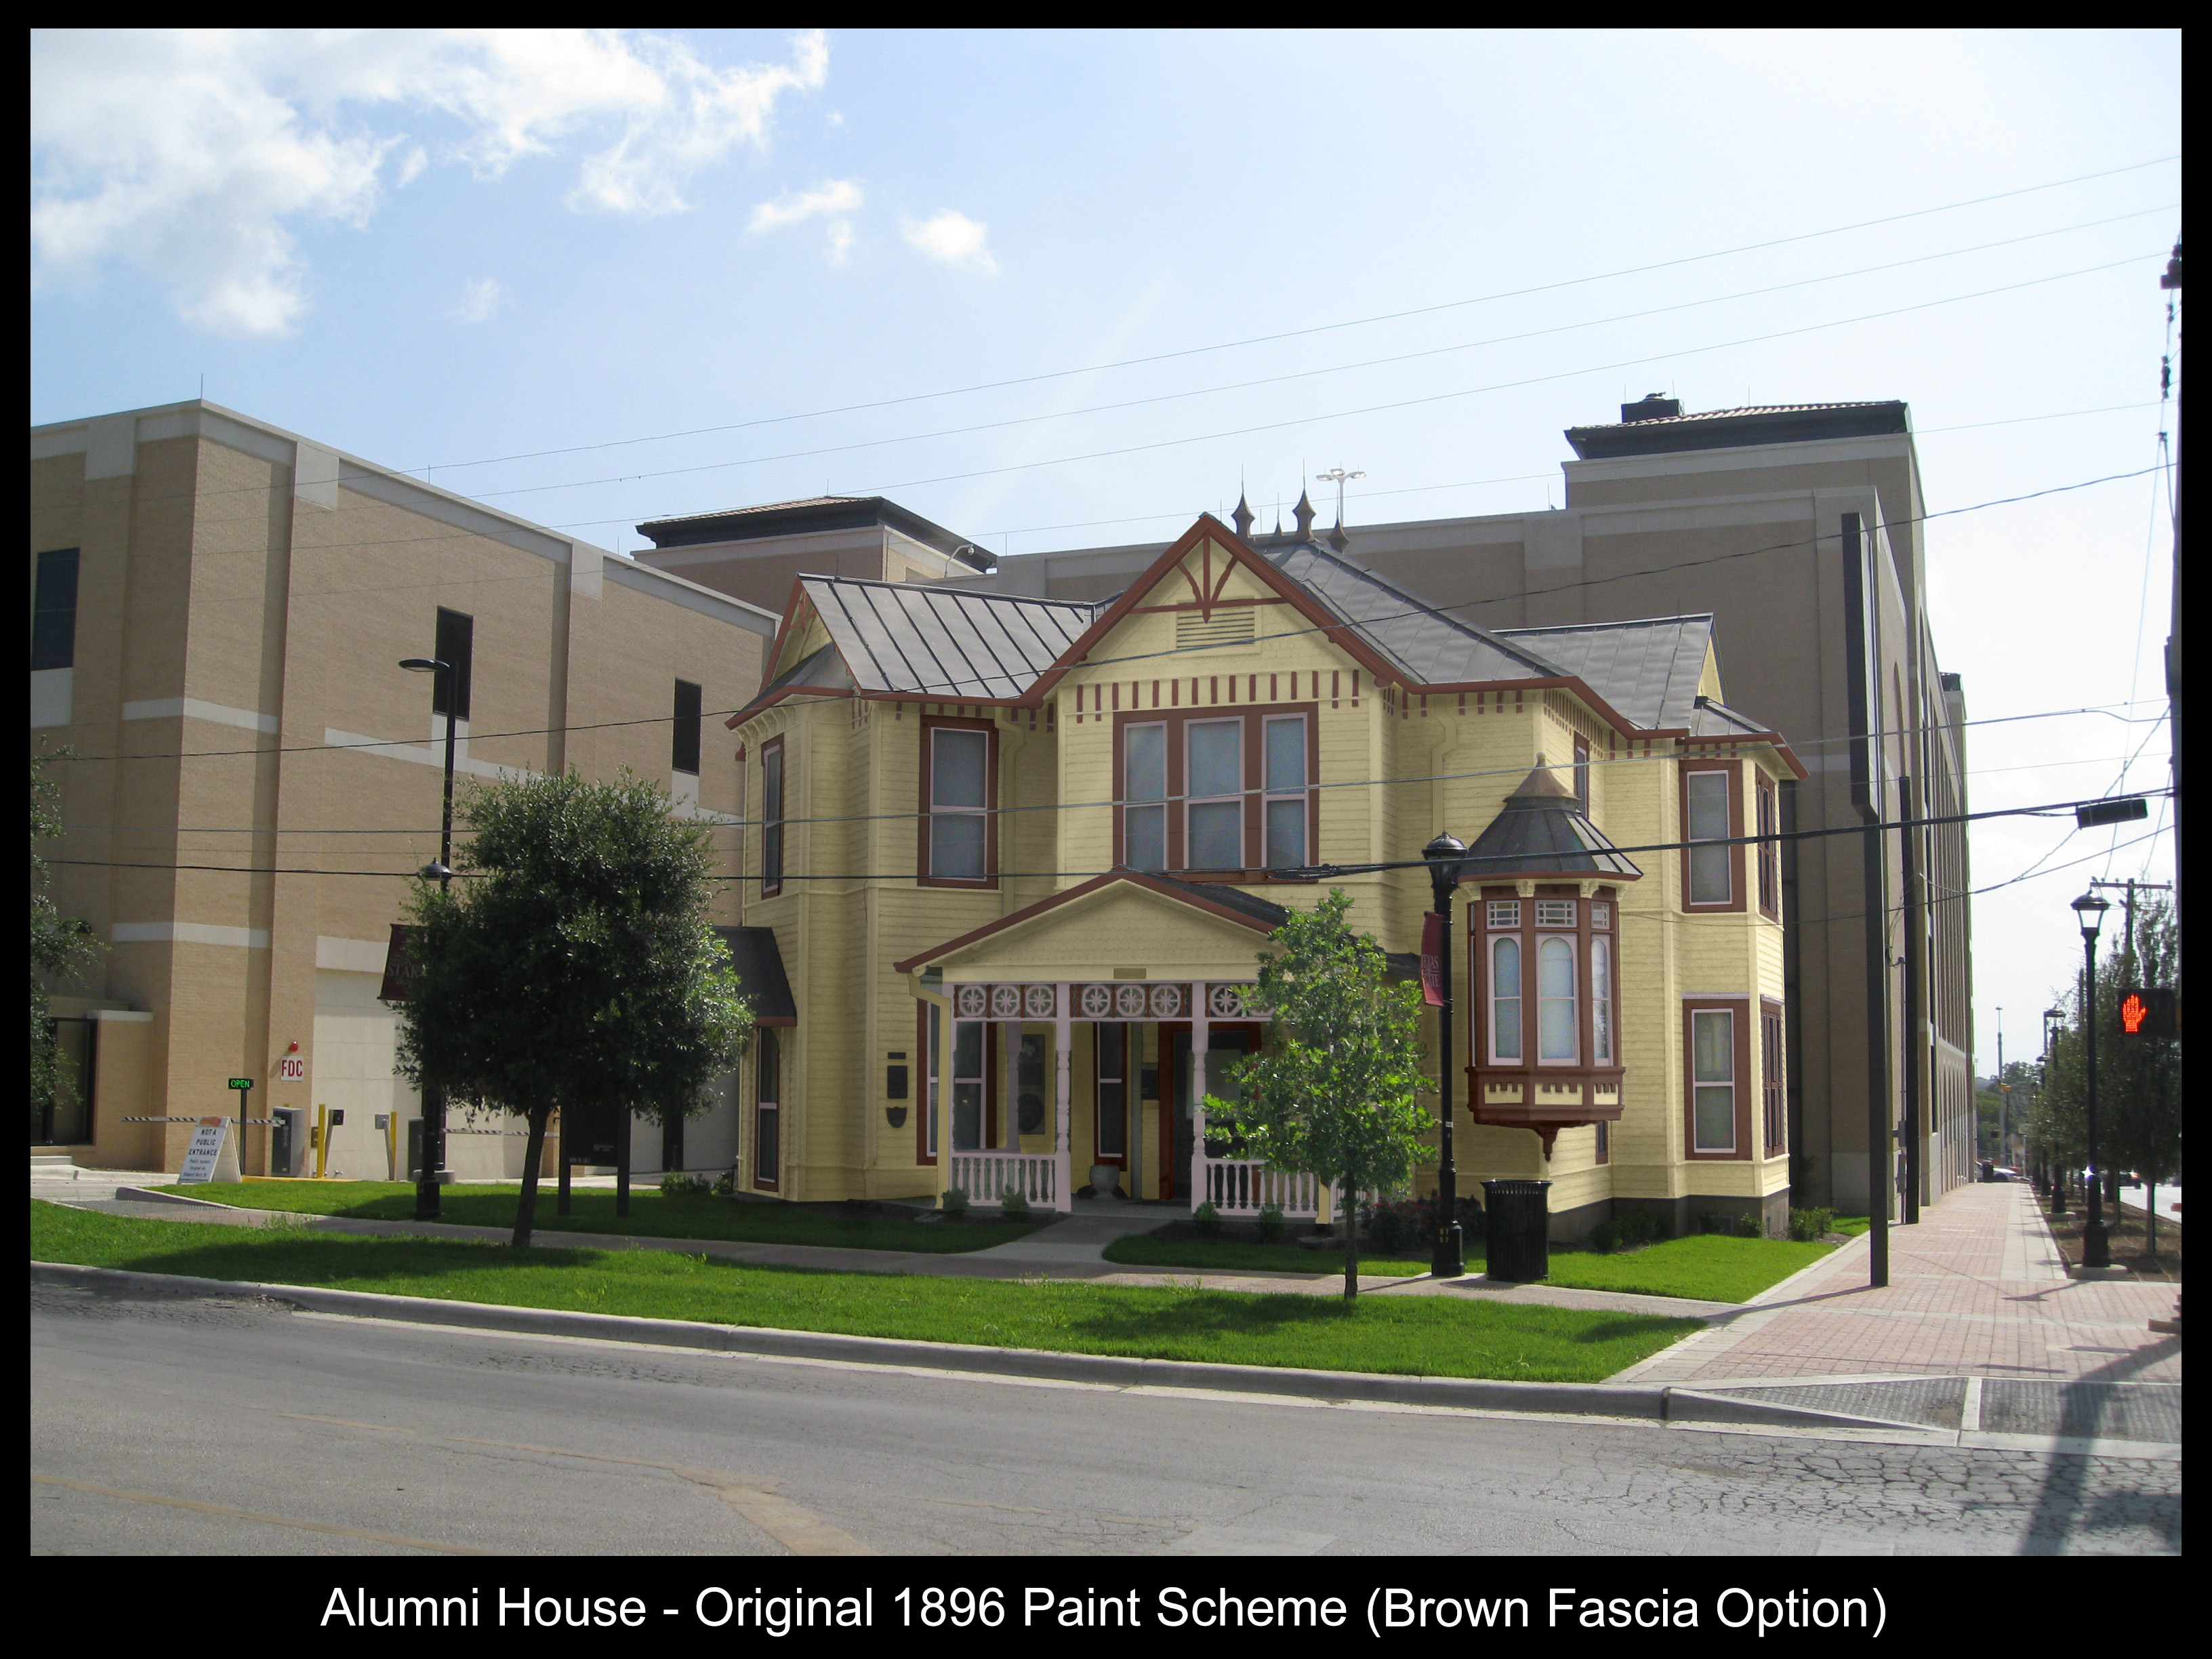 Alumni House restored